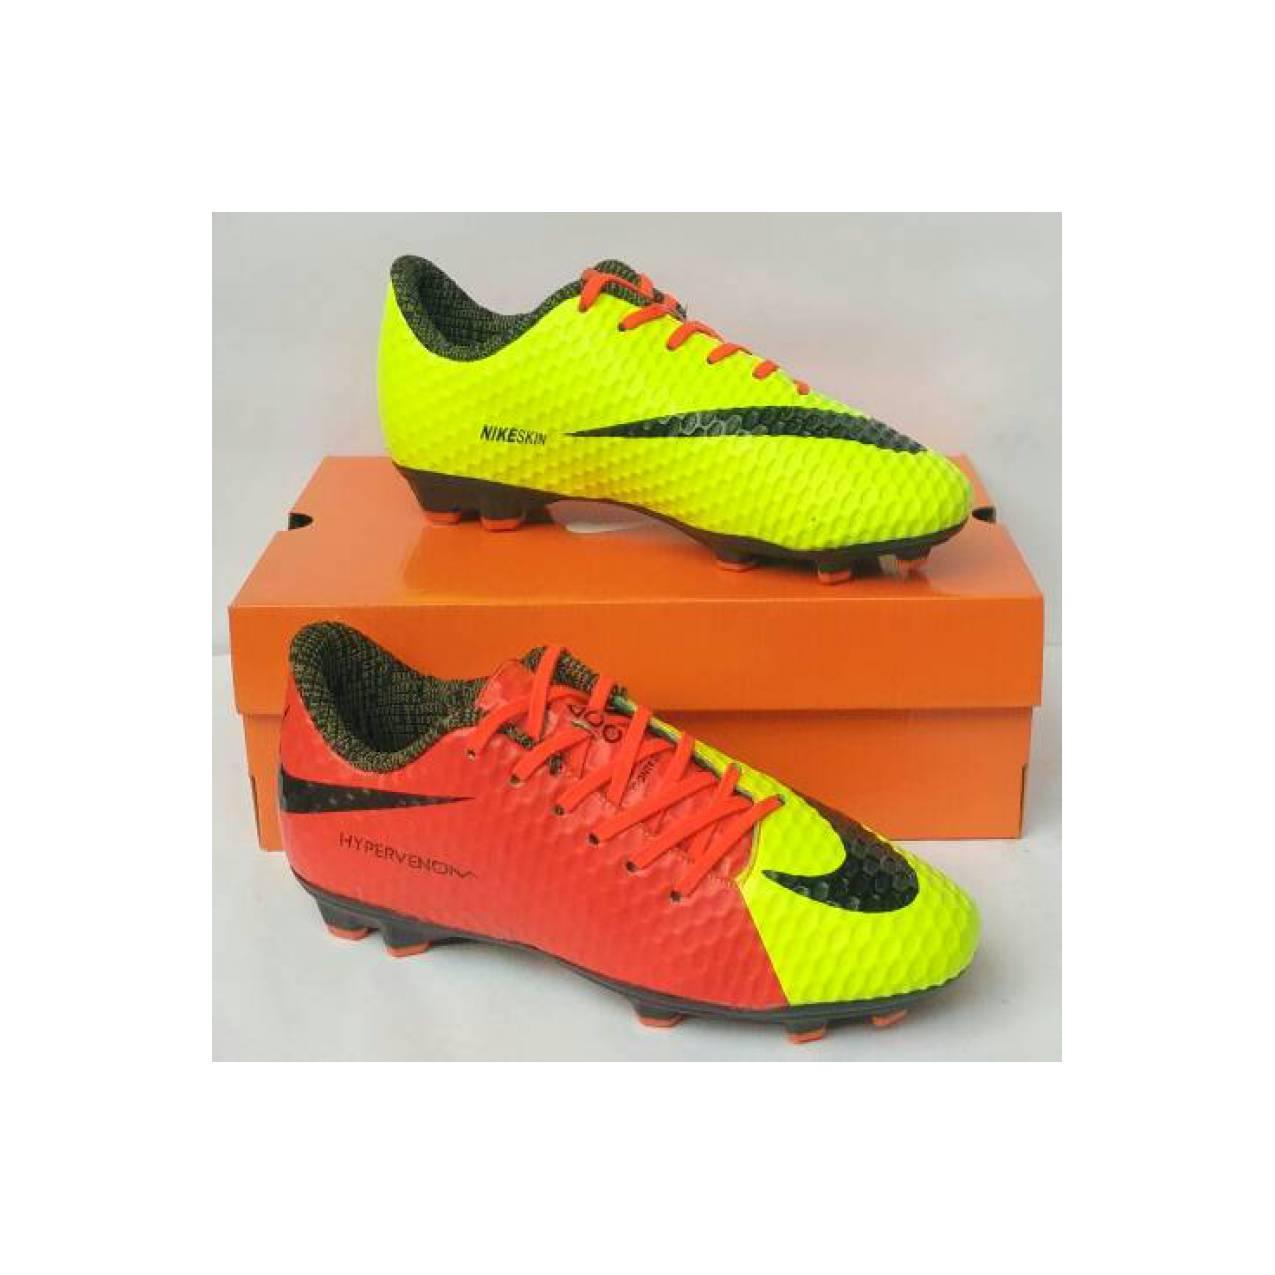 Sepatu Bola Nike Hypervenom Phantom / Olahraga / Sepak Bola & Futsal